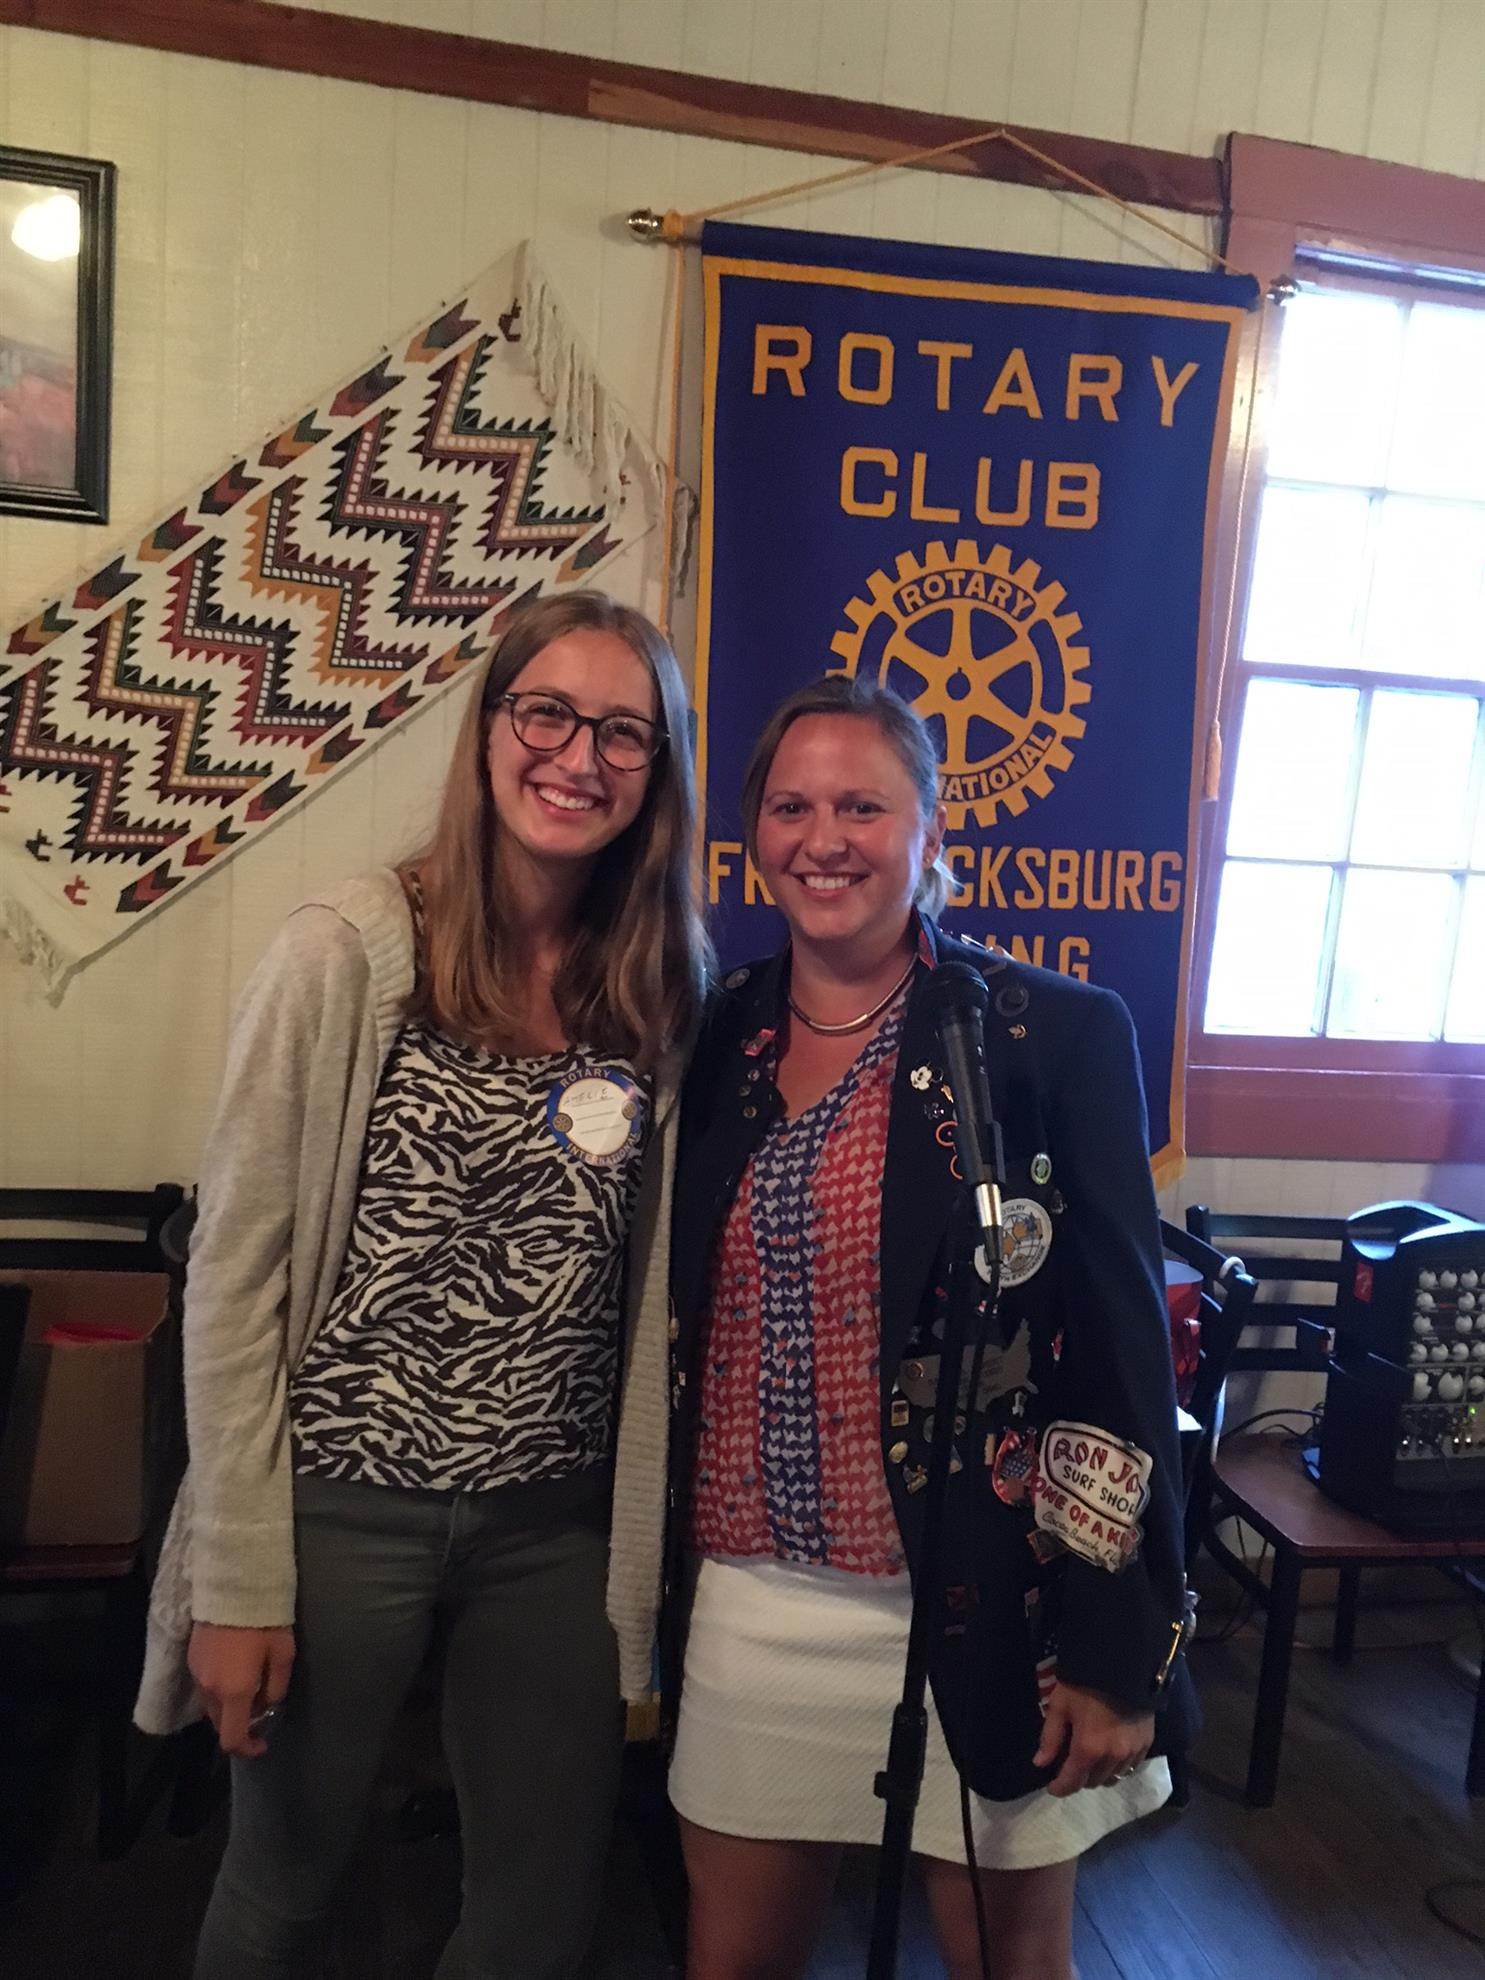 Amelie Teuschl, Rotary Exchange Student and Sarah Eckert-Meurer, Club President